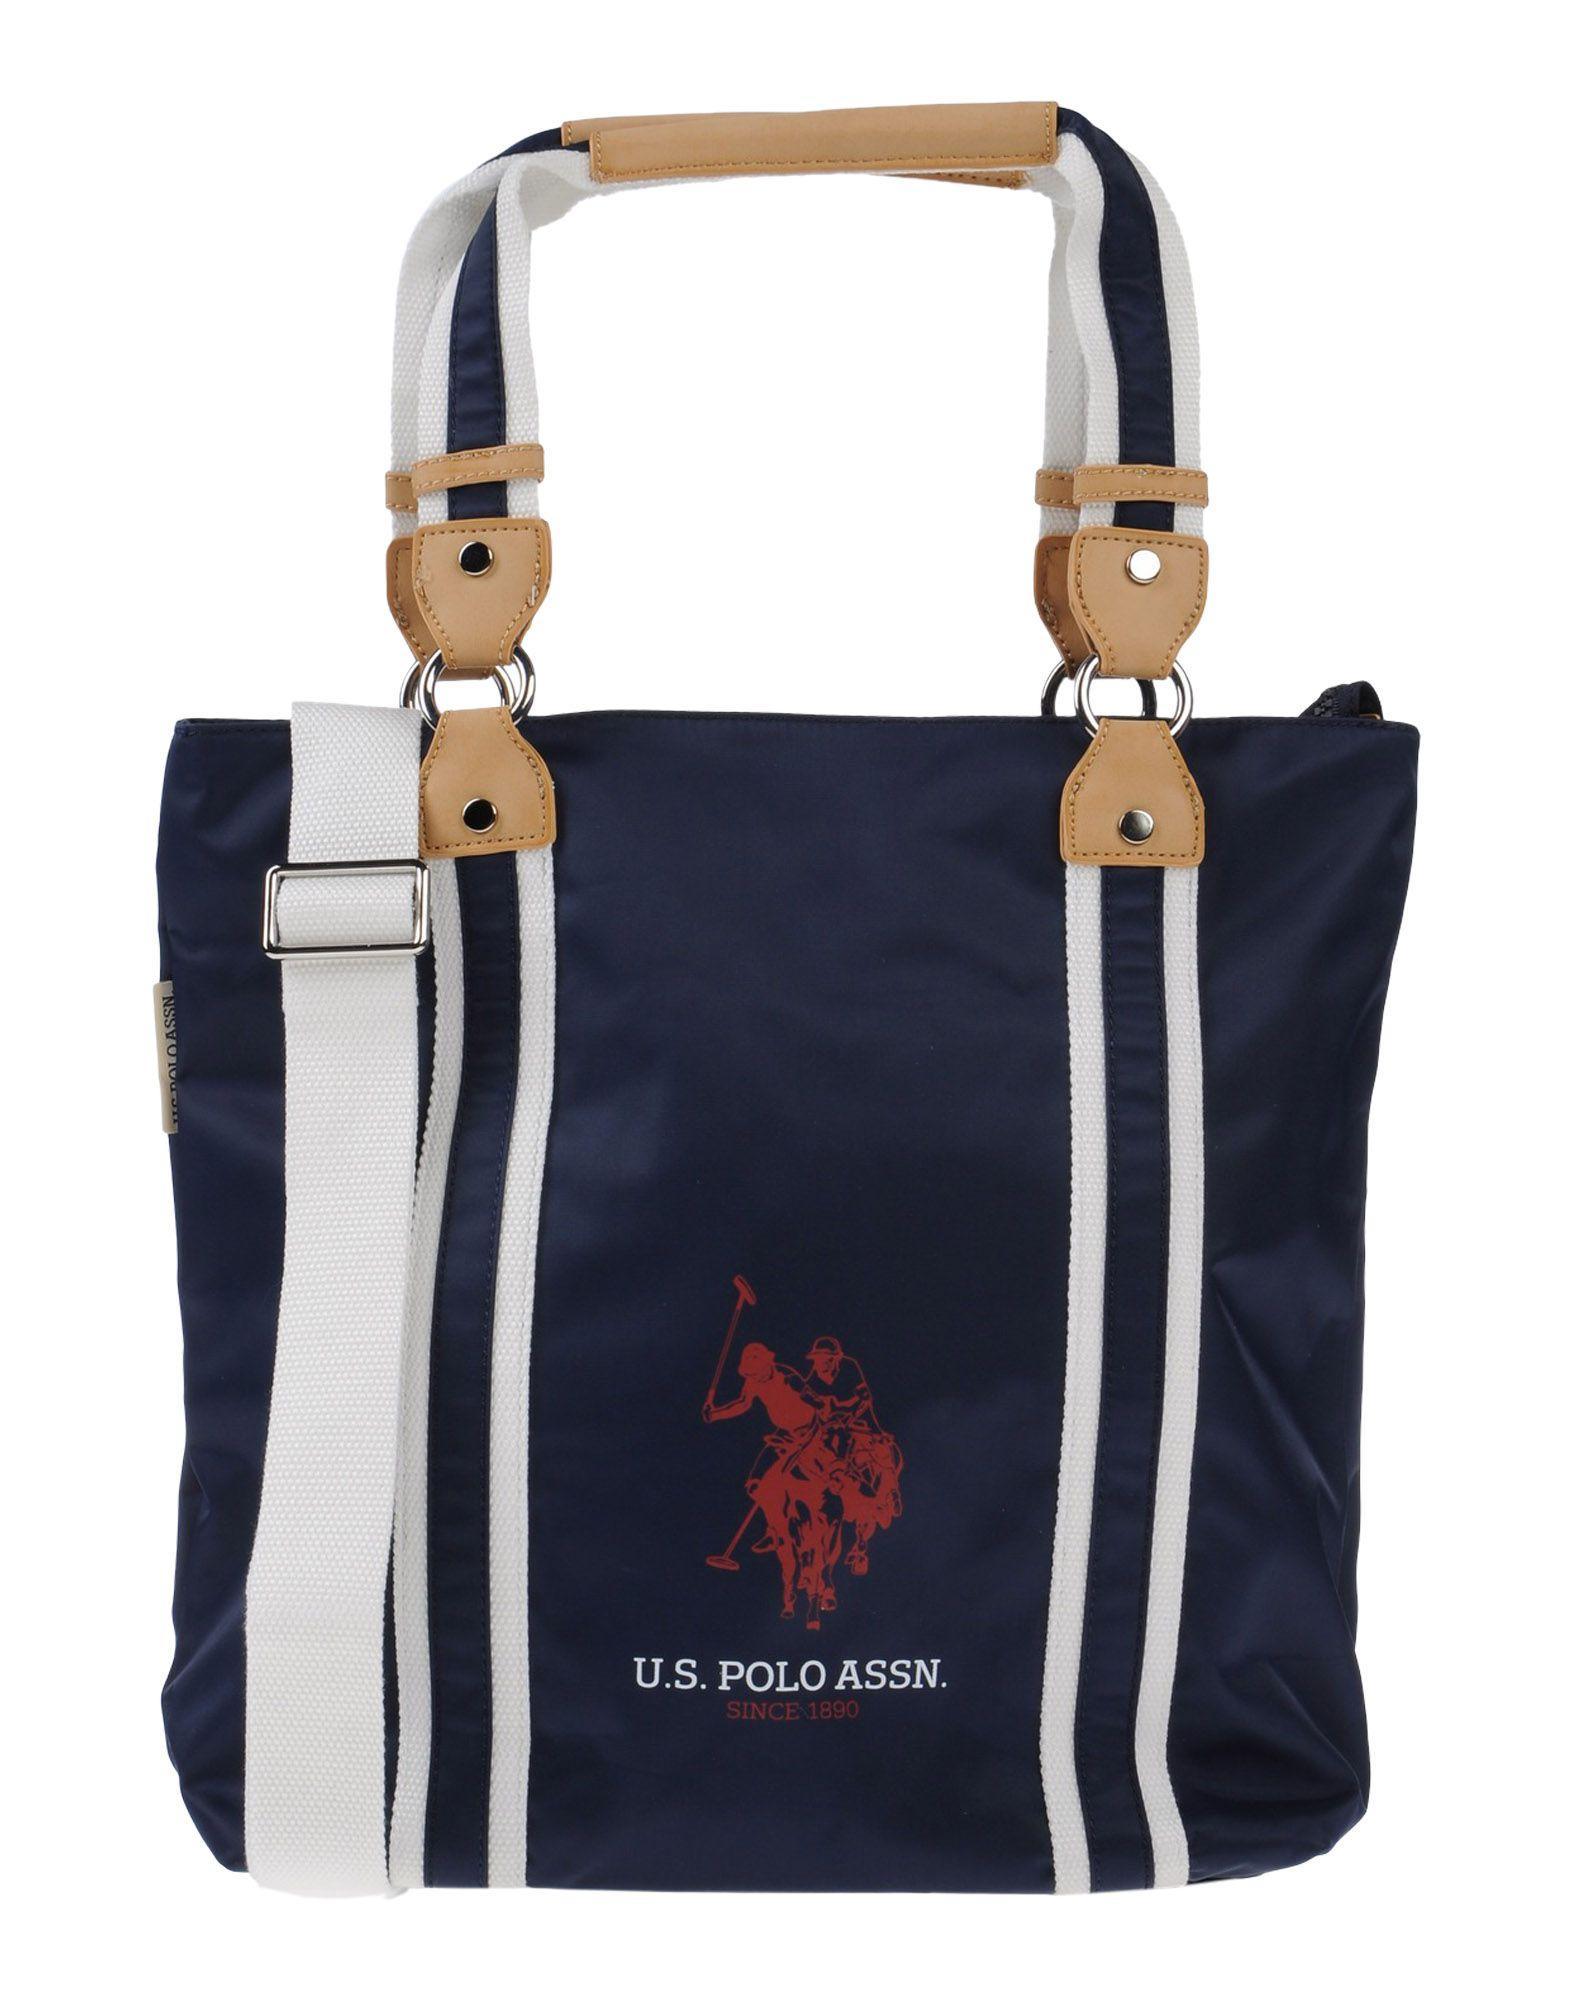 Lyst - U.S. Polo Assn. Handbag in Blue 9f80720d66